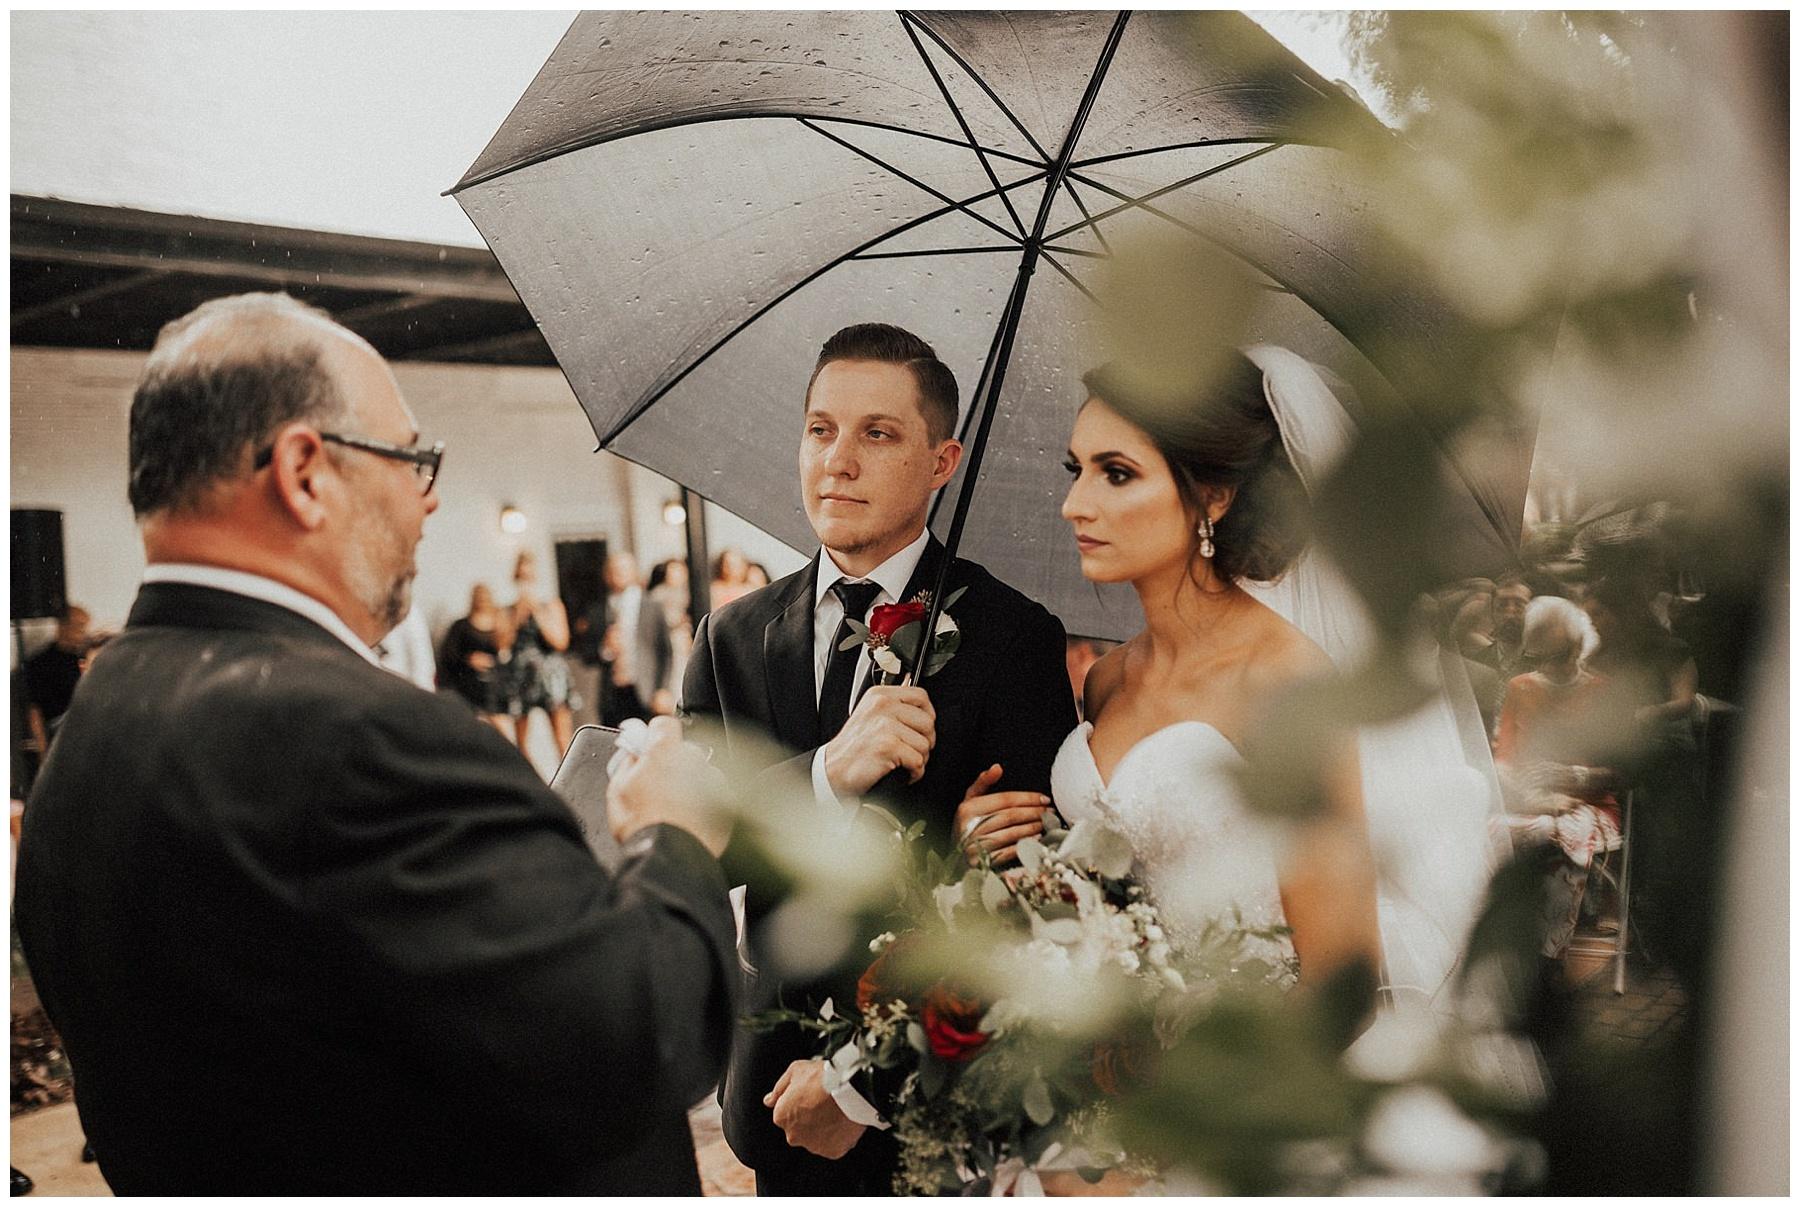 YBOR Wedding Tampa Wedding Photographer-71.jpg